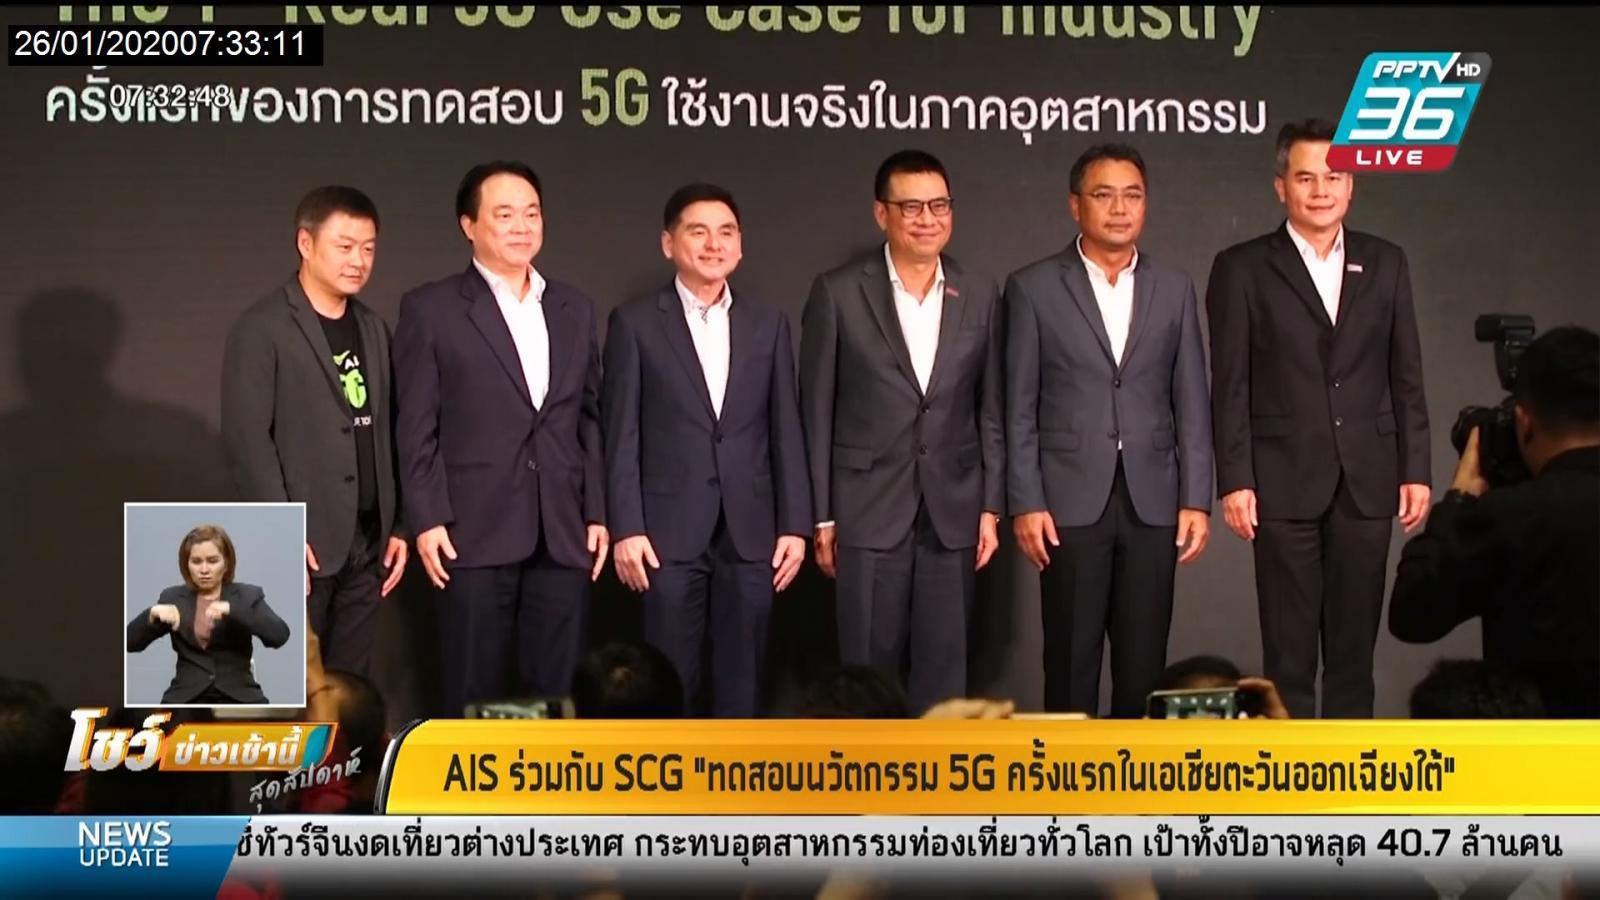 AIS ร่วมมือกับ SCG ทดสอบนวัตกรรม 5G ใช้ภาคอุตสาหกรรมครั้งแรกในเอเชียตะวันออกเฉียงใต้